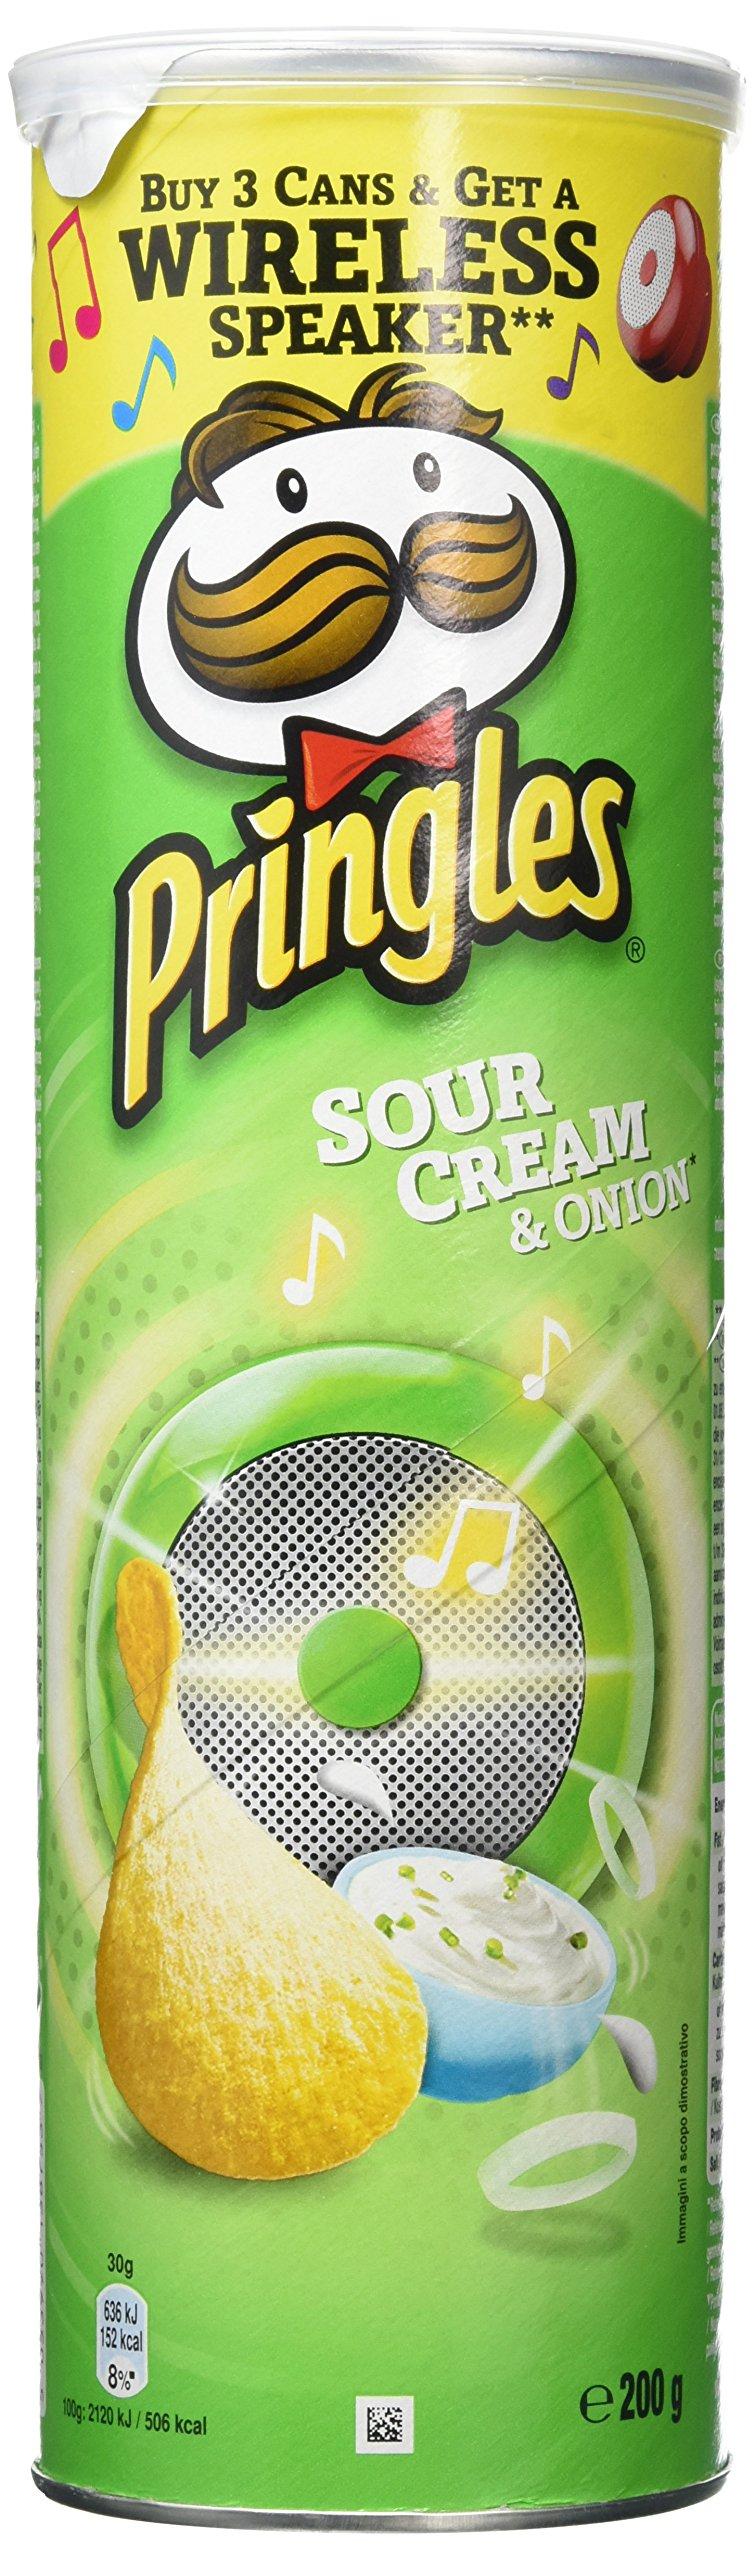 Pringles Sour Cream & Onion Crisps, 200g (Pack of 6)